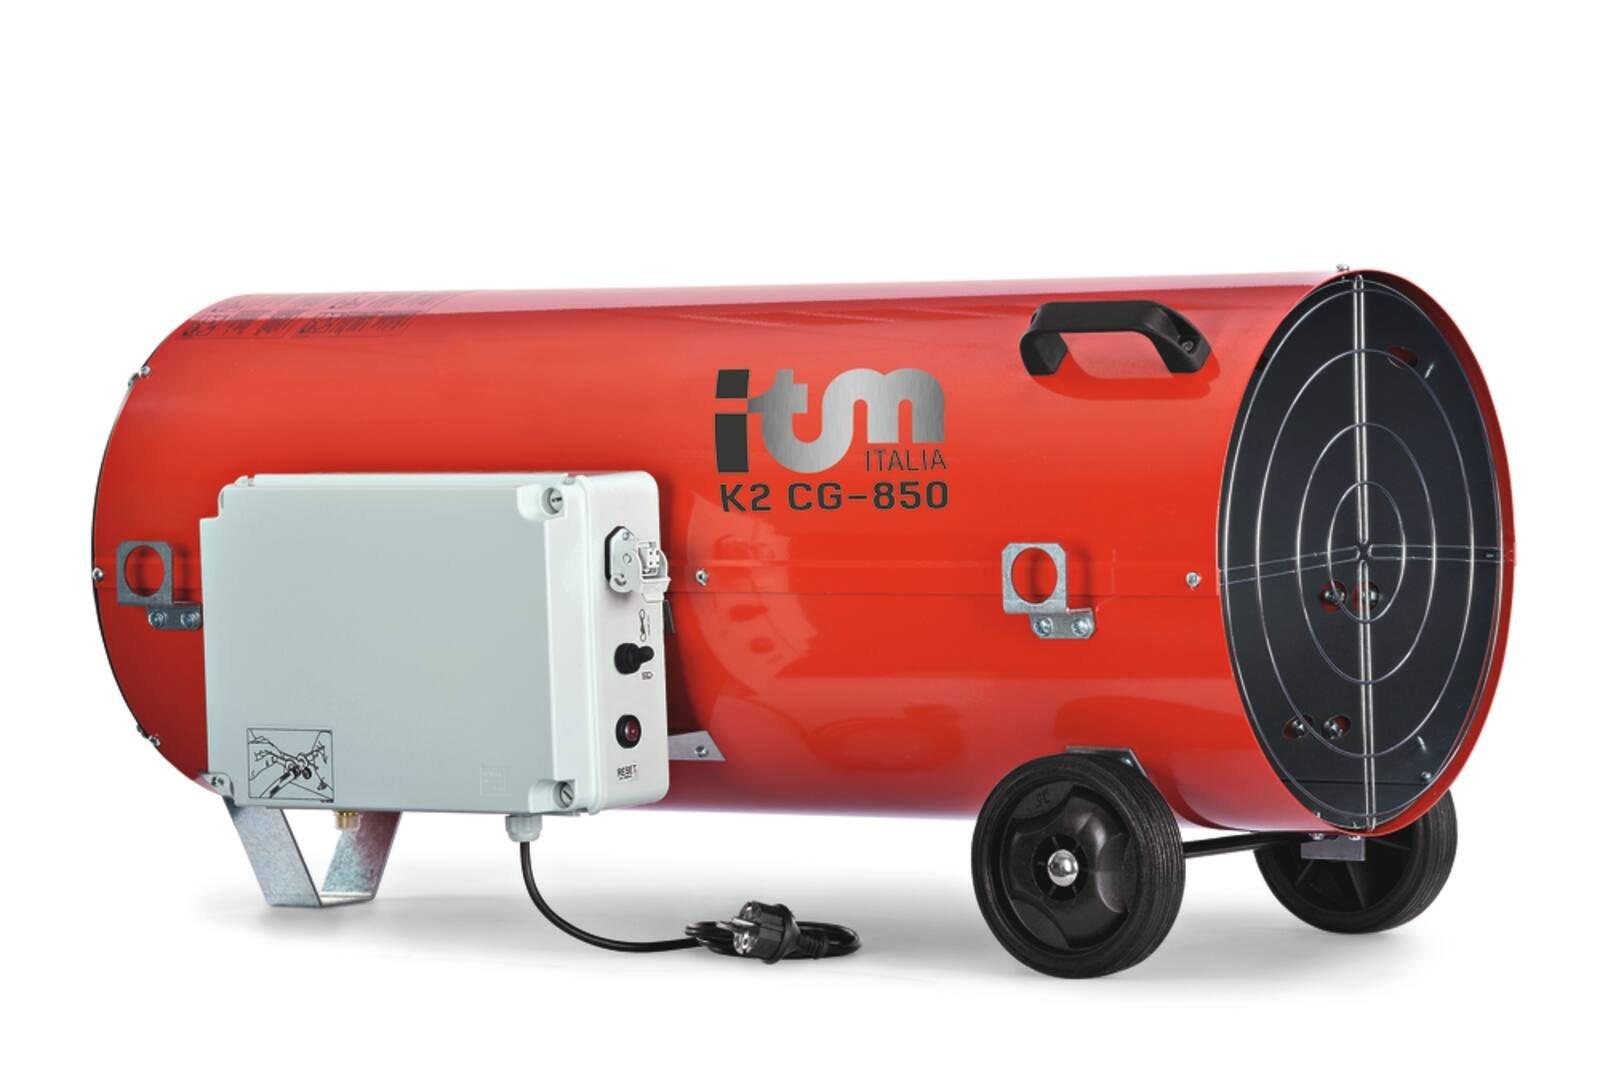 Chauffage GAZ K2 CG 850 M